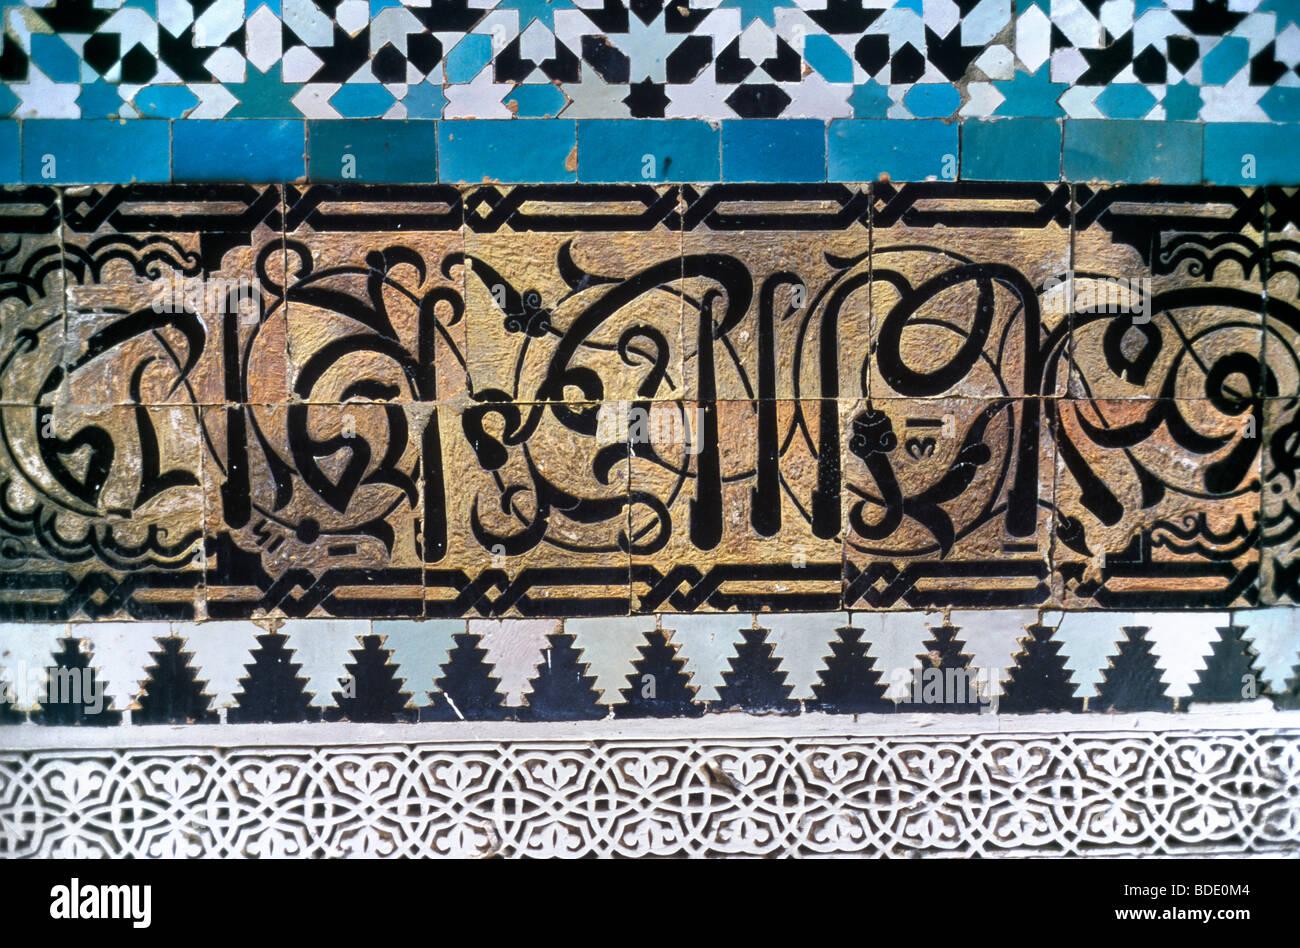 Ornate Arabic Inscription on the Bou Inania Medersa in Fez Morocco - Stock Image